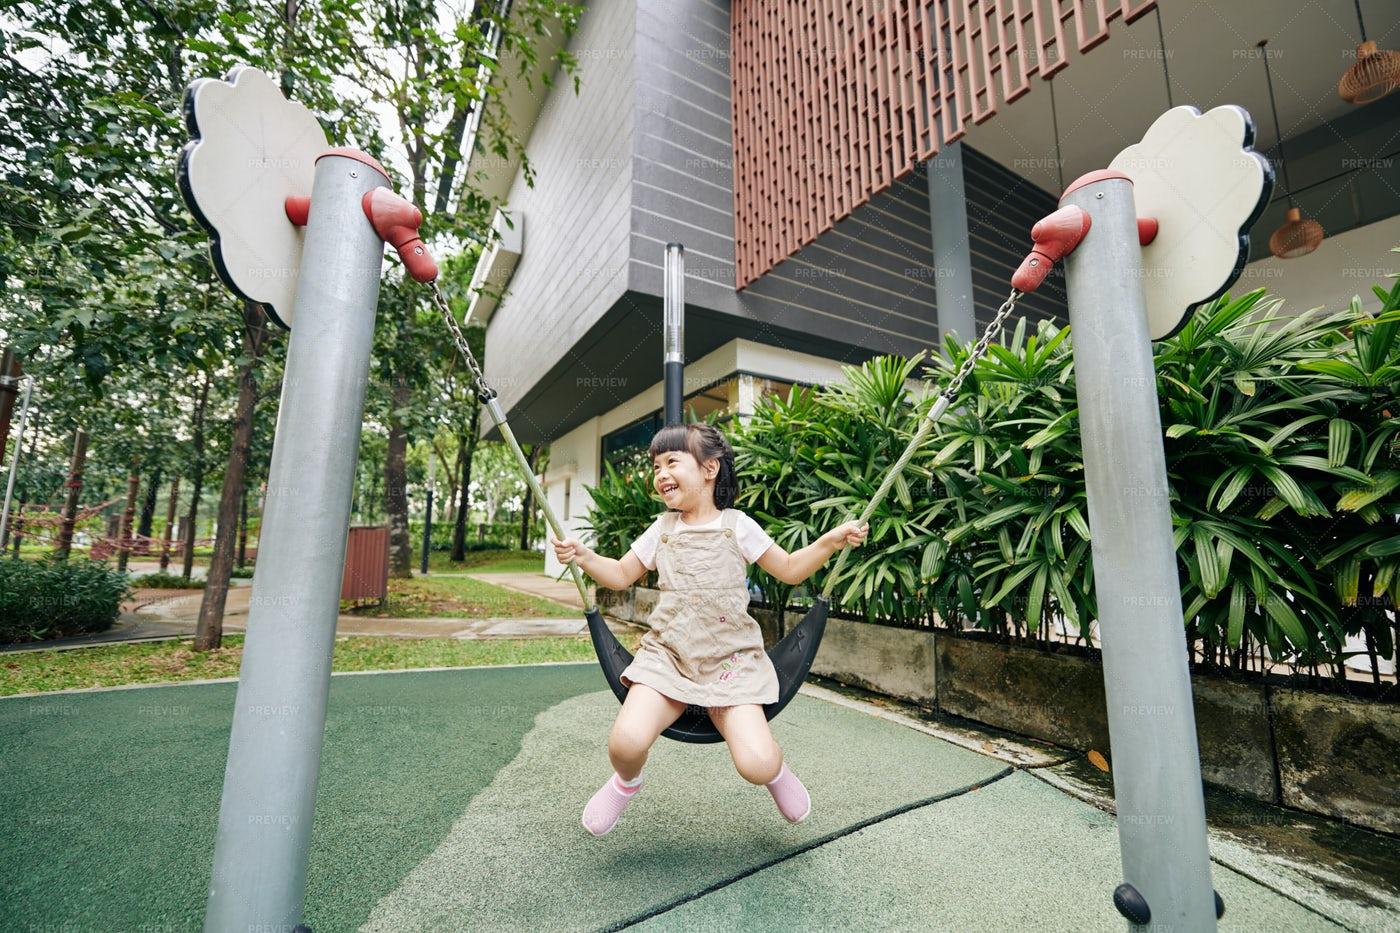 Girl Swinging On Playground: Stock Photos